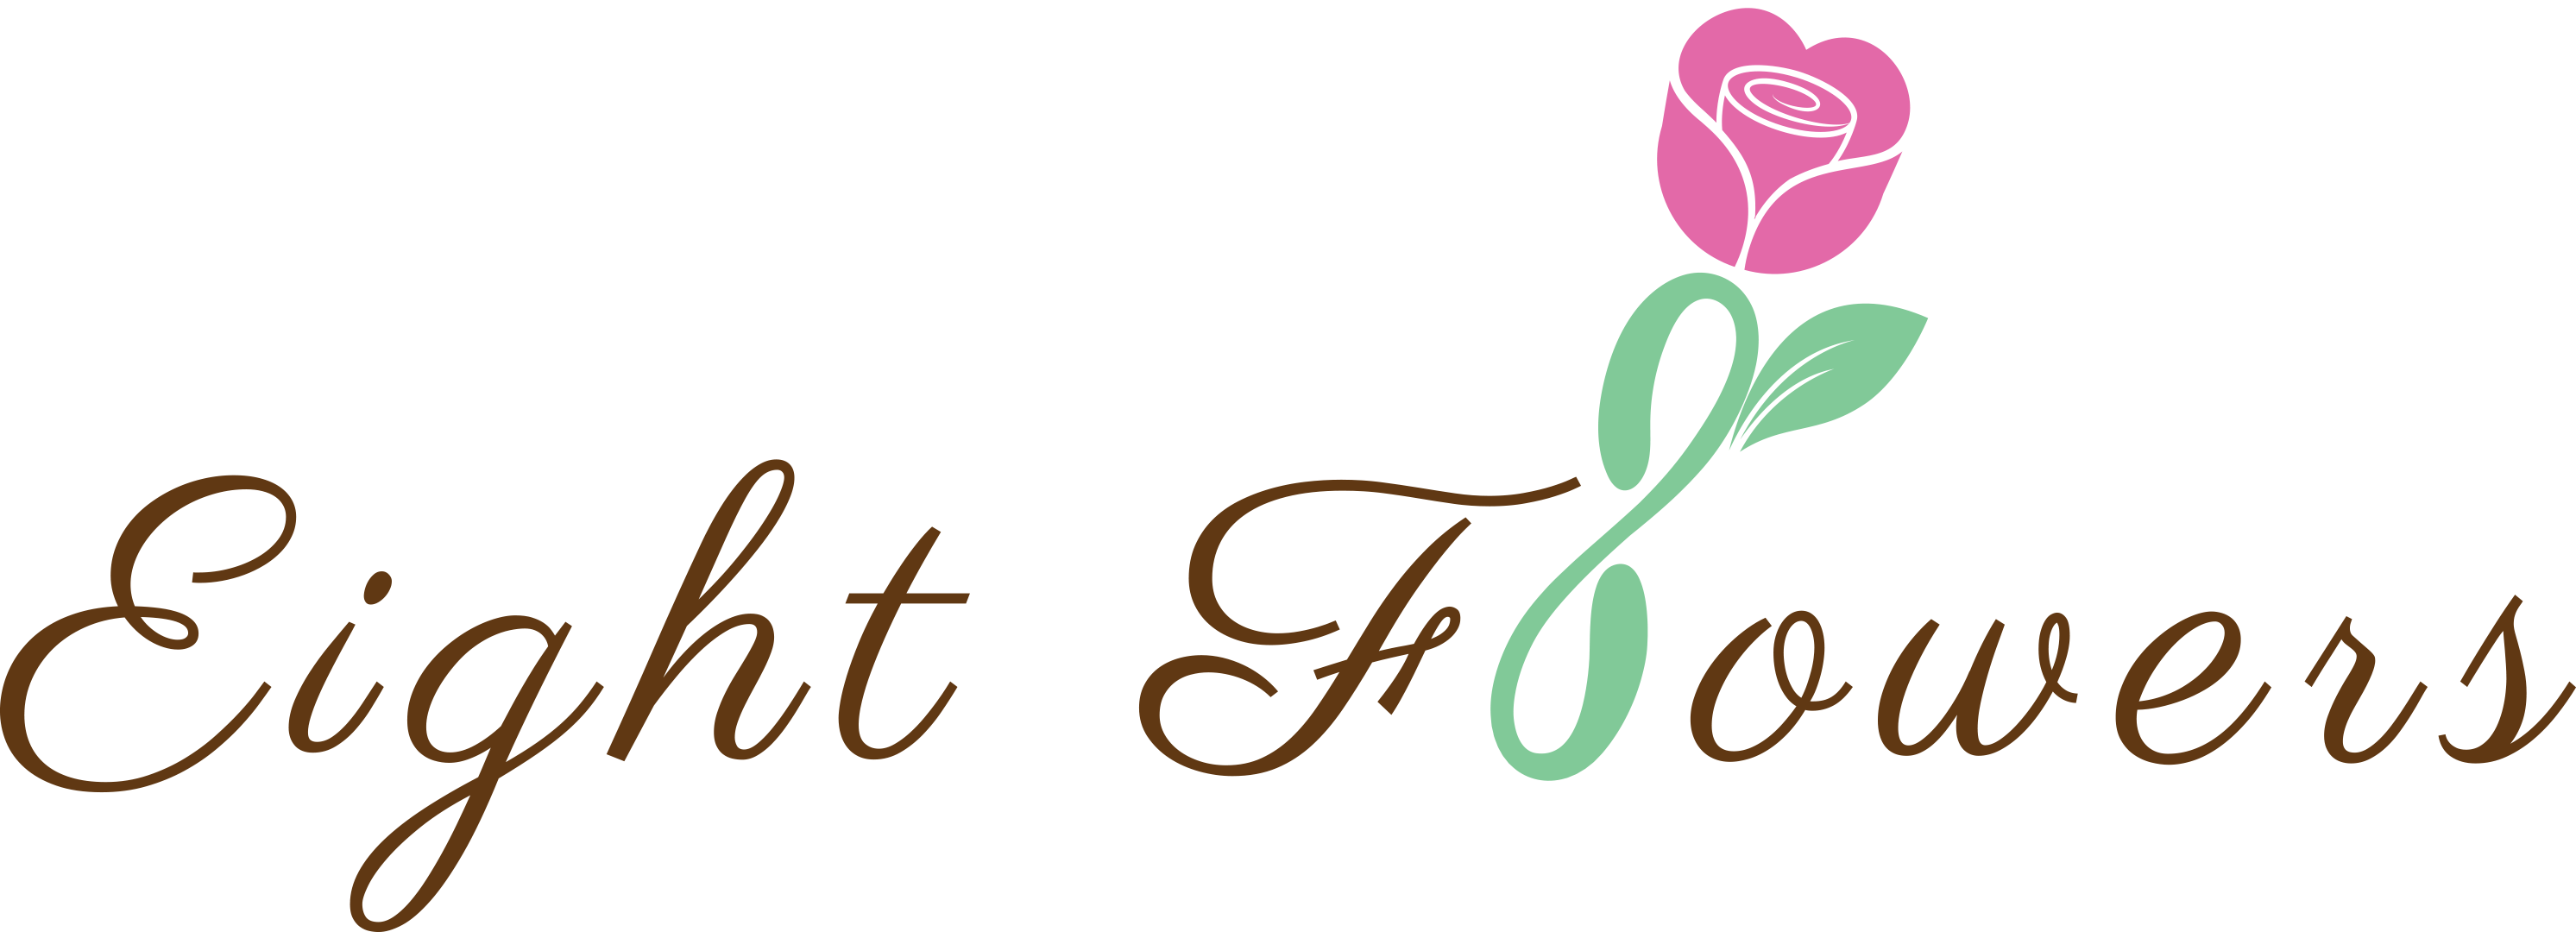 EF-Final-Logo-v2